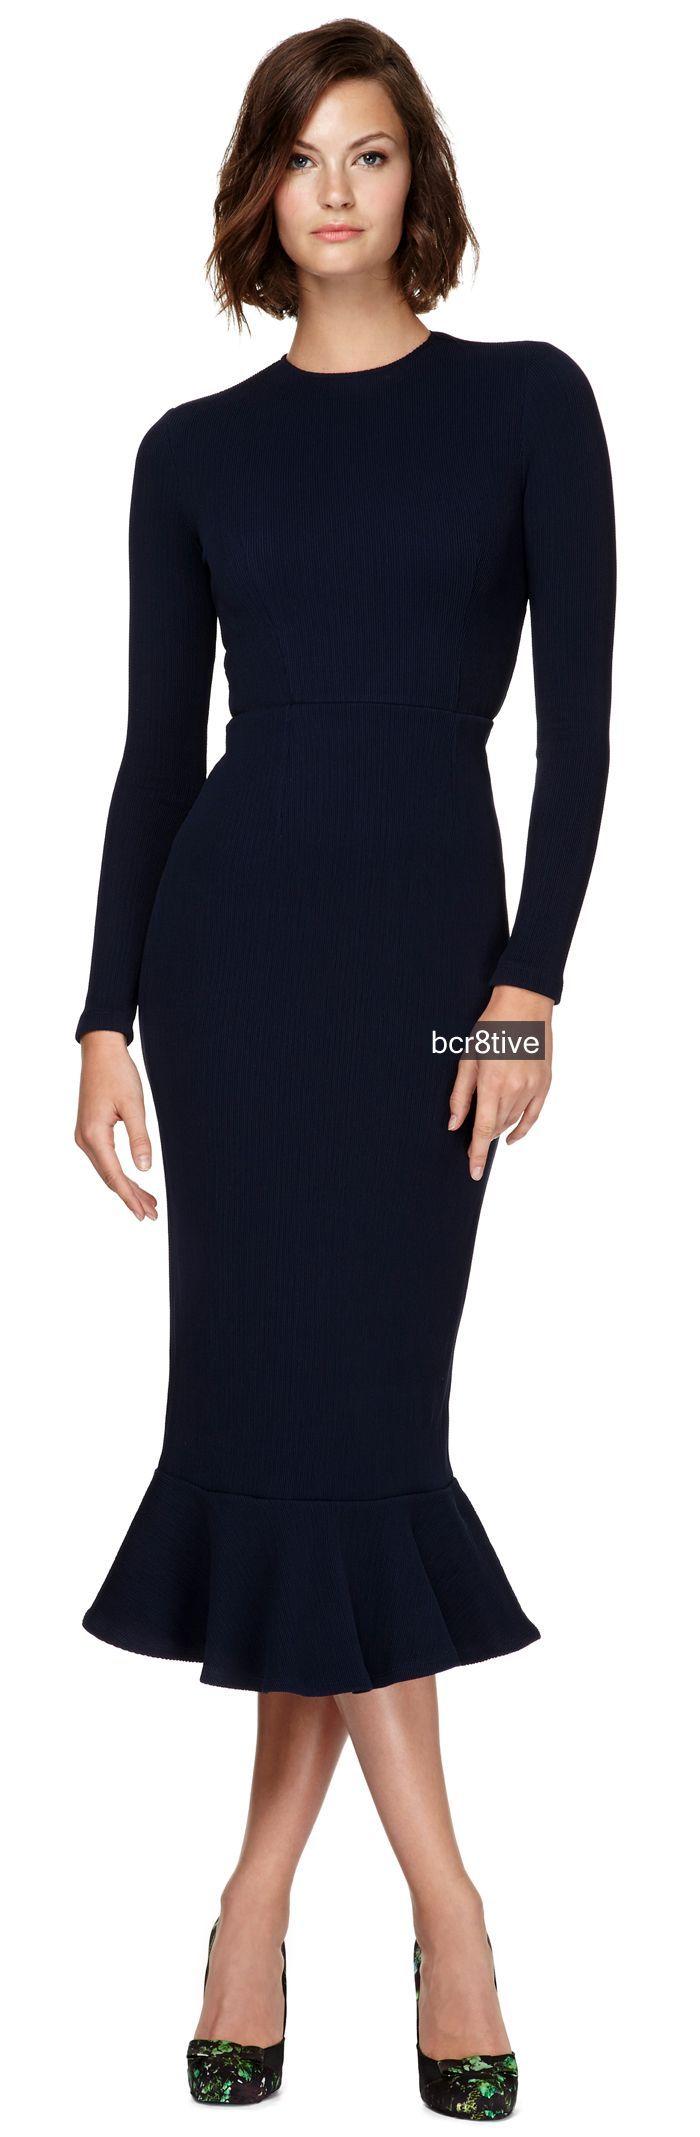 Perfection!                                                   Mace Maxi Dress on Moda